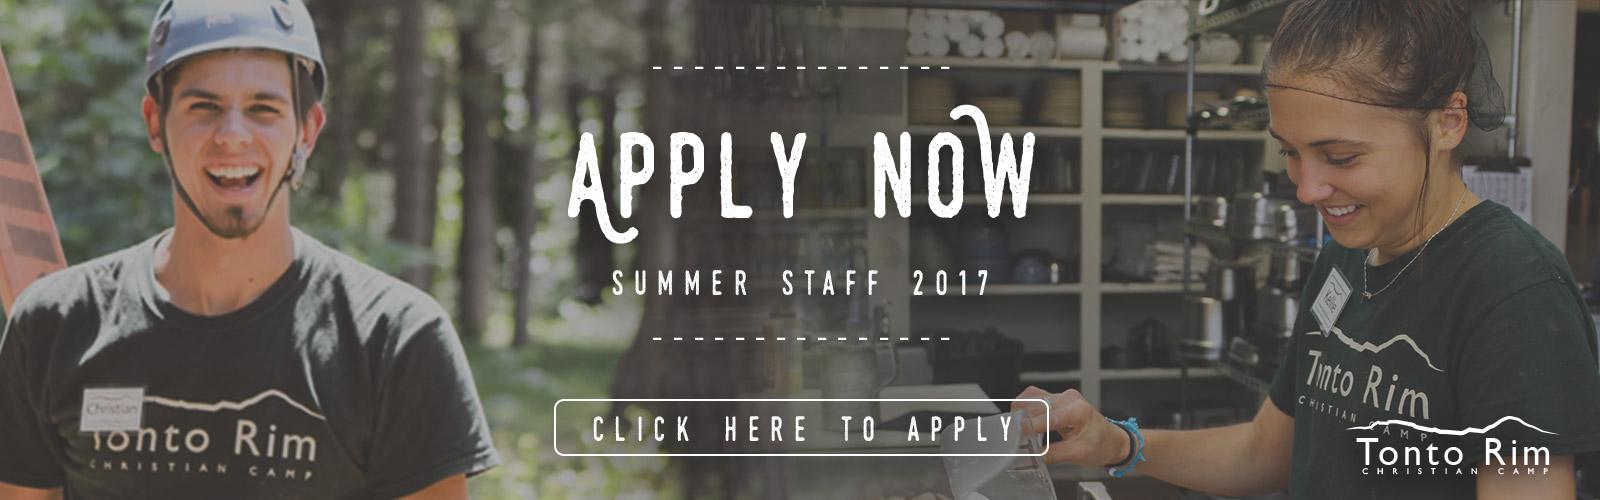 Apply Now - Summer Staff 2016